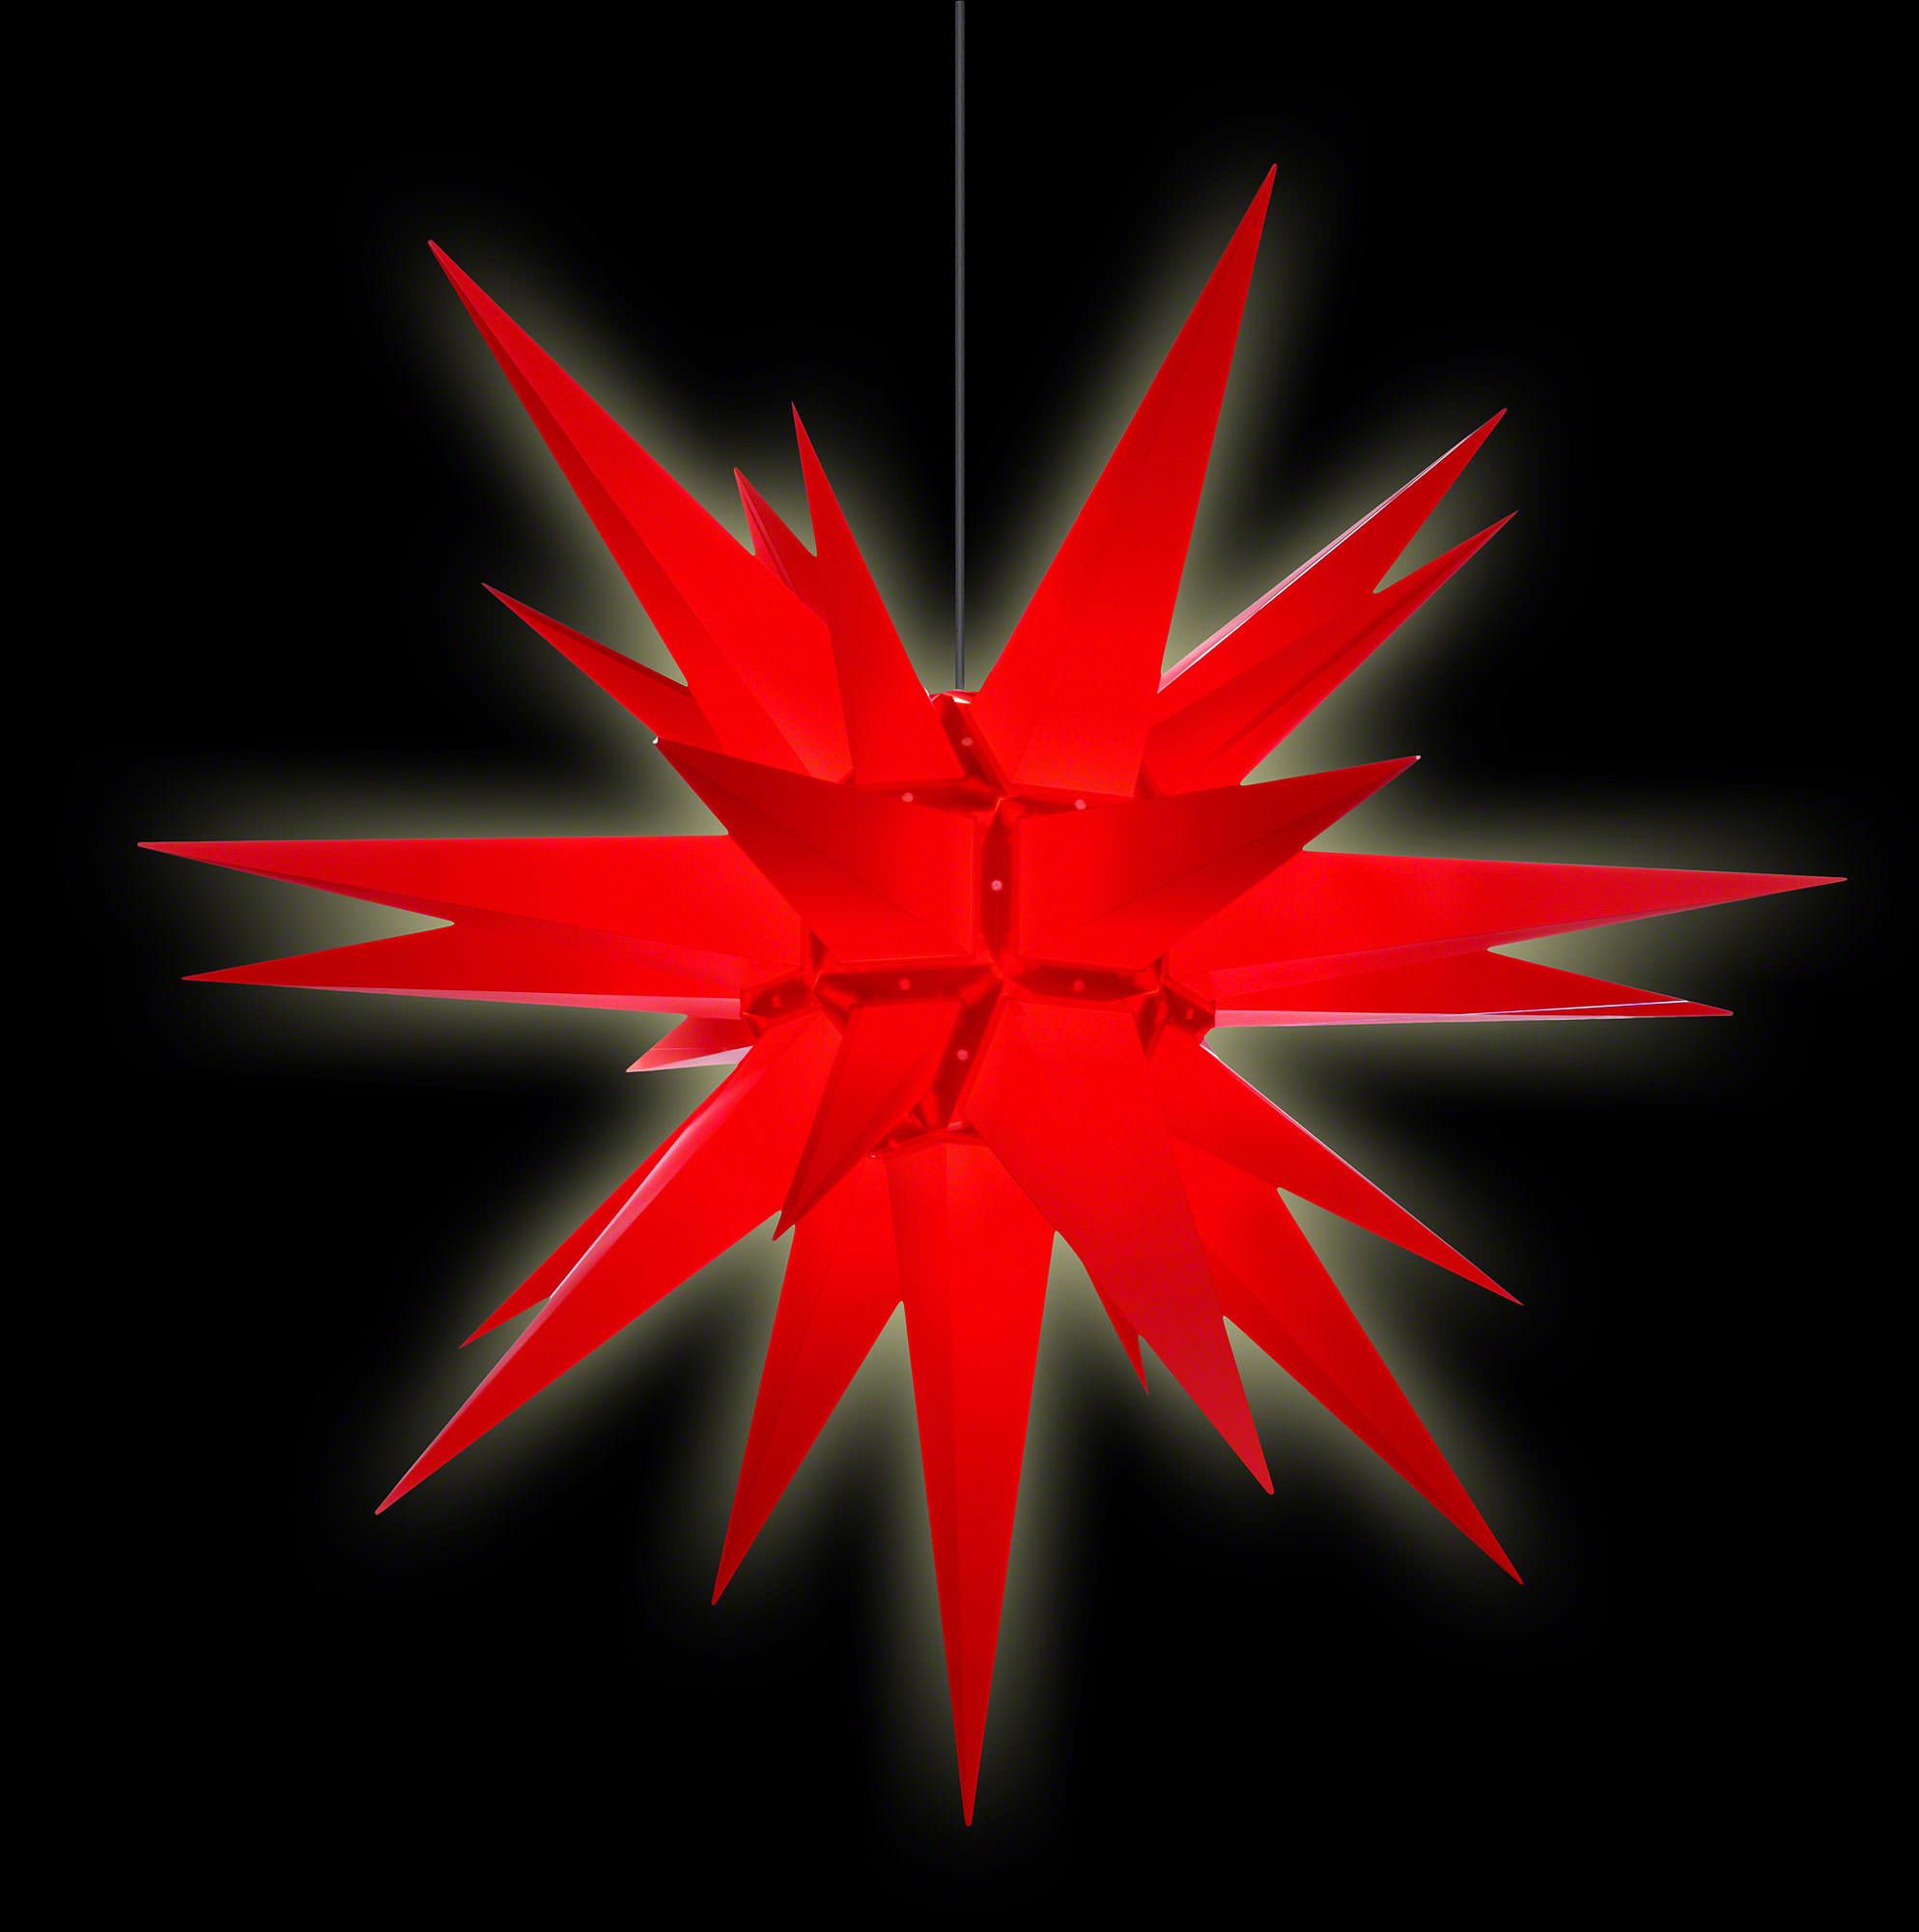 herrnhuter moravian star a13 red plastic 130cm 51in by herrnhuter sterne. Black Bedroom Furniture Sets. Home Design Ideas